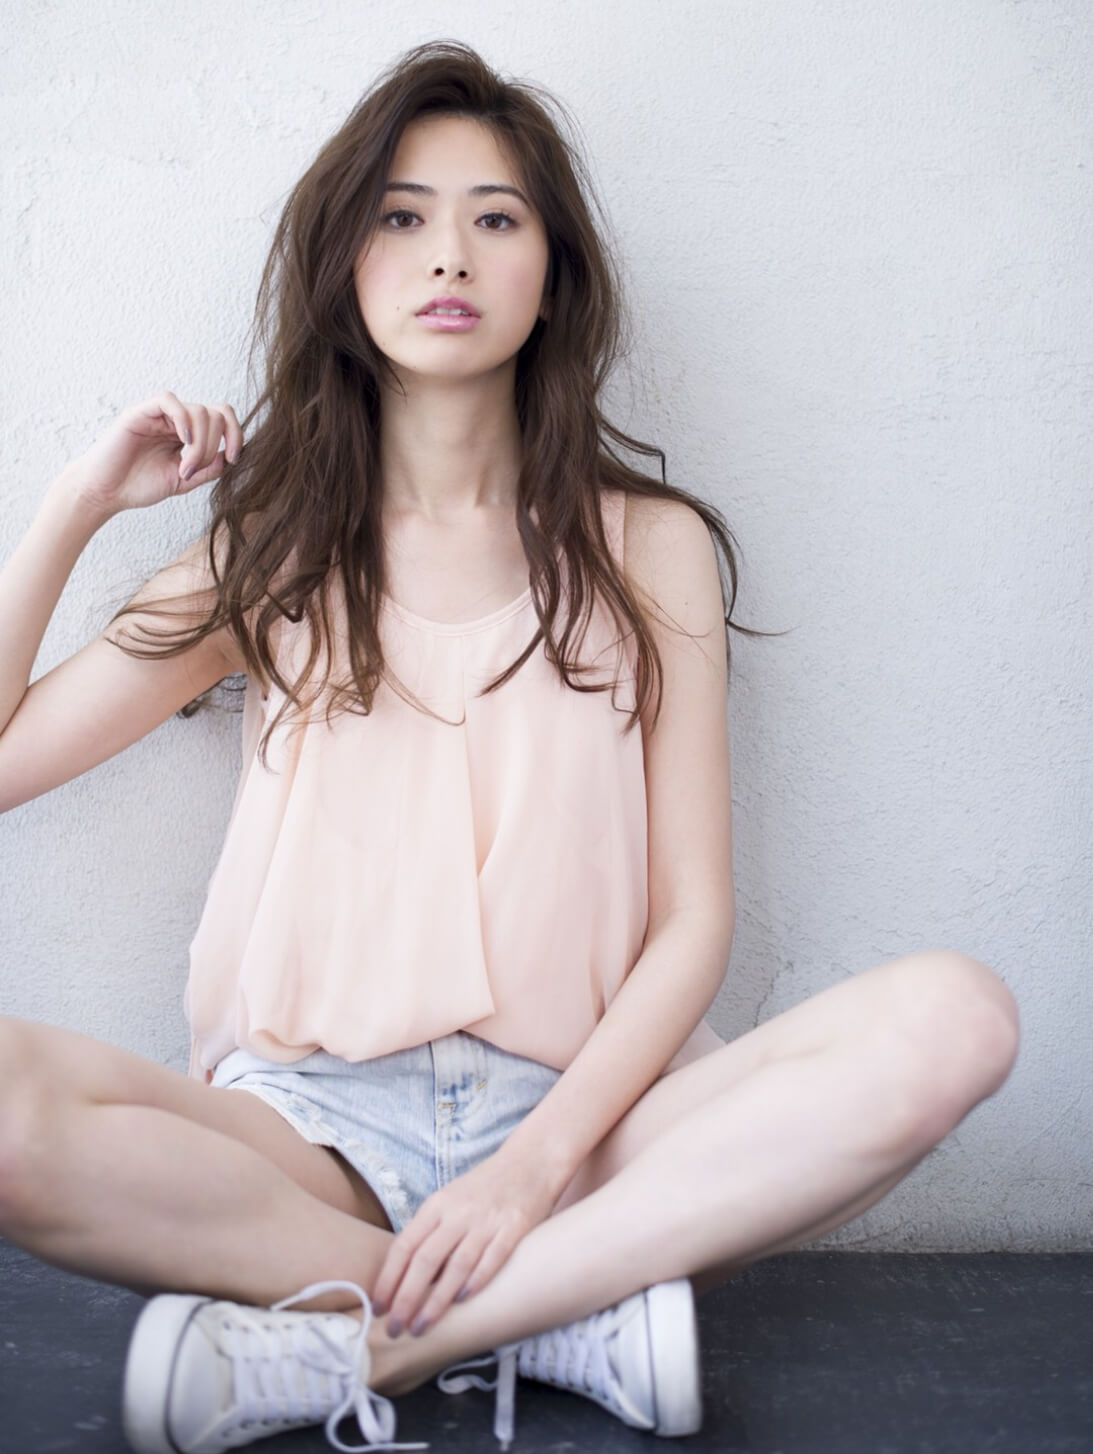 勝間 亮平<span>/ HAIR AND MAKEUP</span>